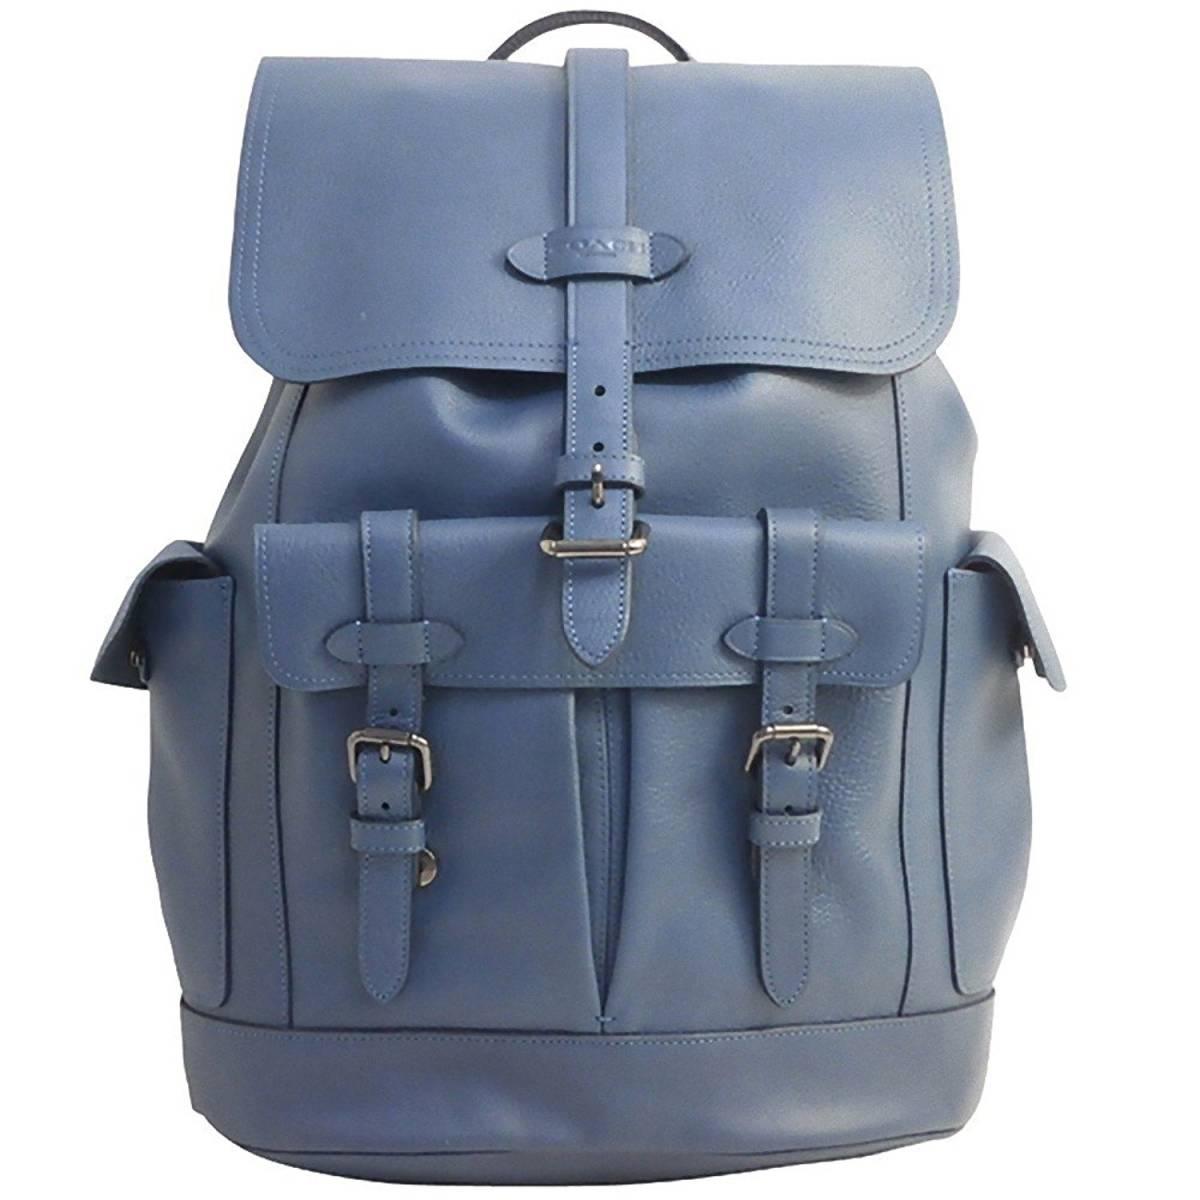 fa8ead02b50 new goods Coach F23202 Hudson leather backpack QBDEN Denim : Real ...